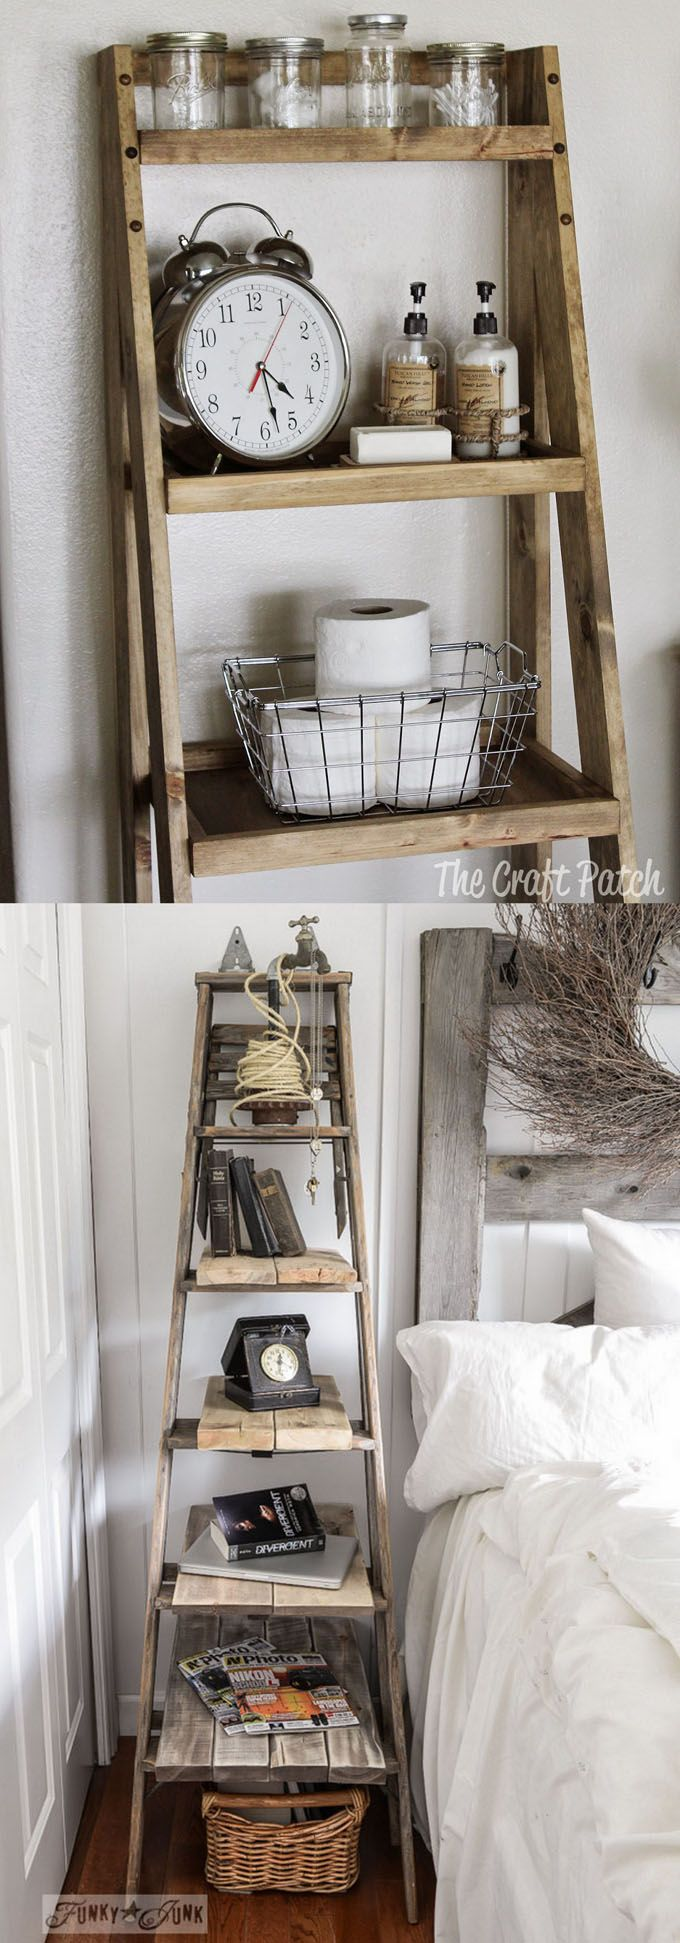 Ladder shelf leaning wall storage narrow shelf white lacquer